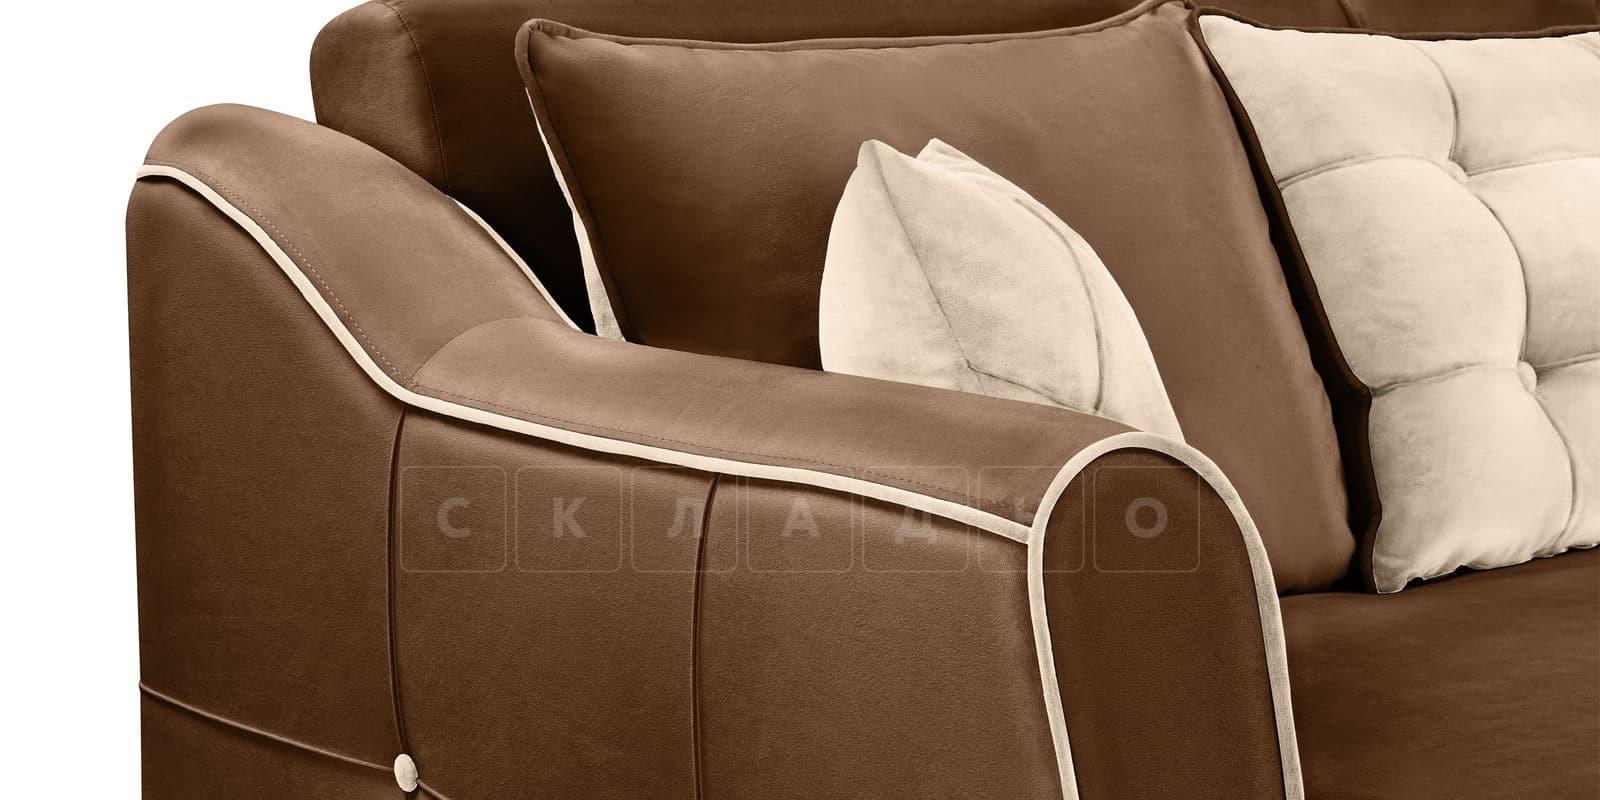 Диван Флэтфорд велюр коричневый фото 5 | интернет-магазин Складно